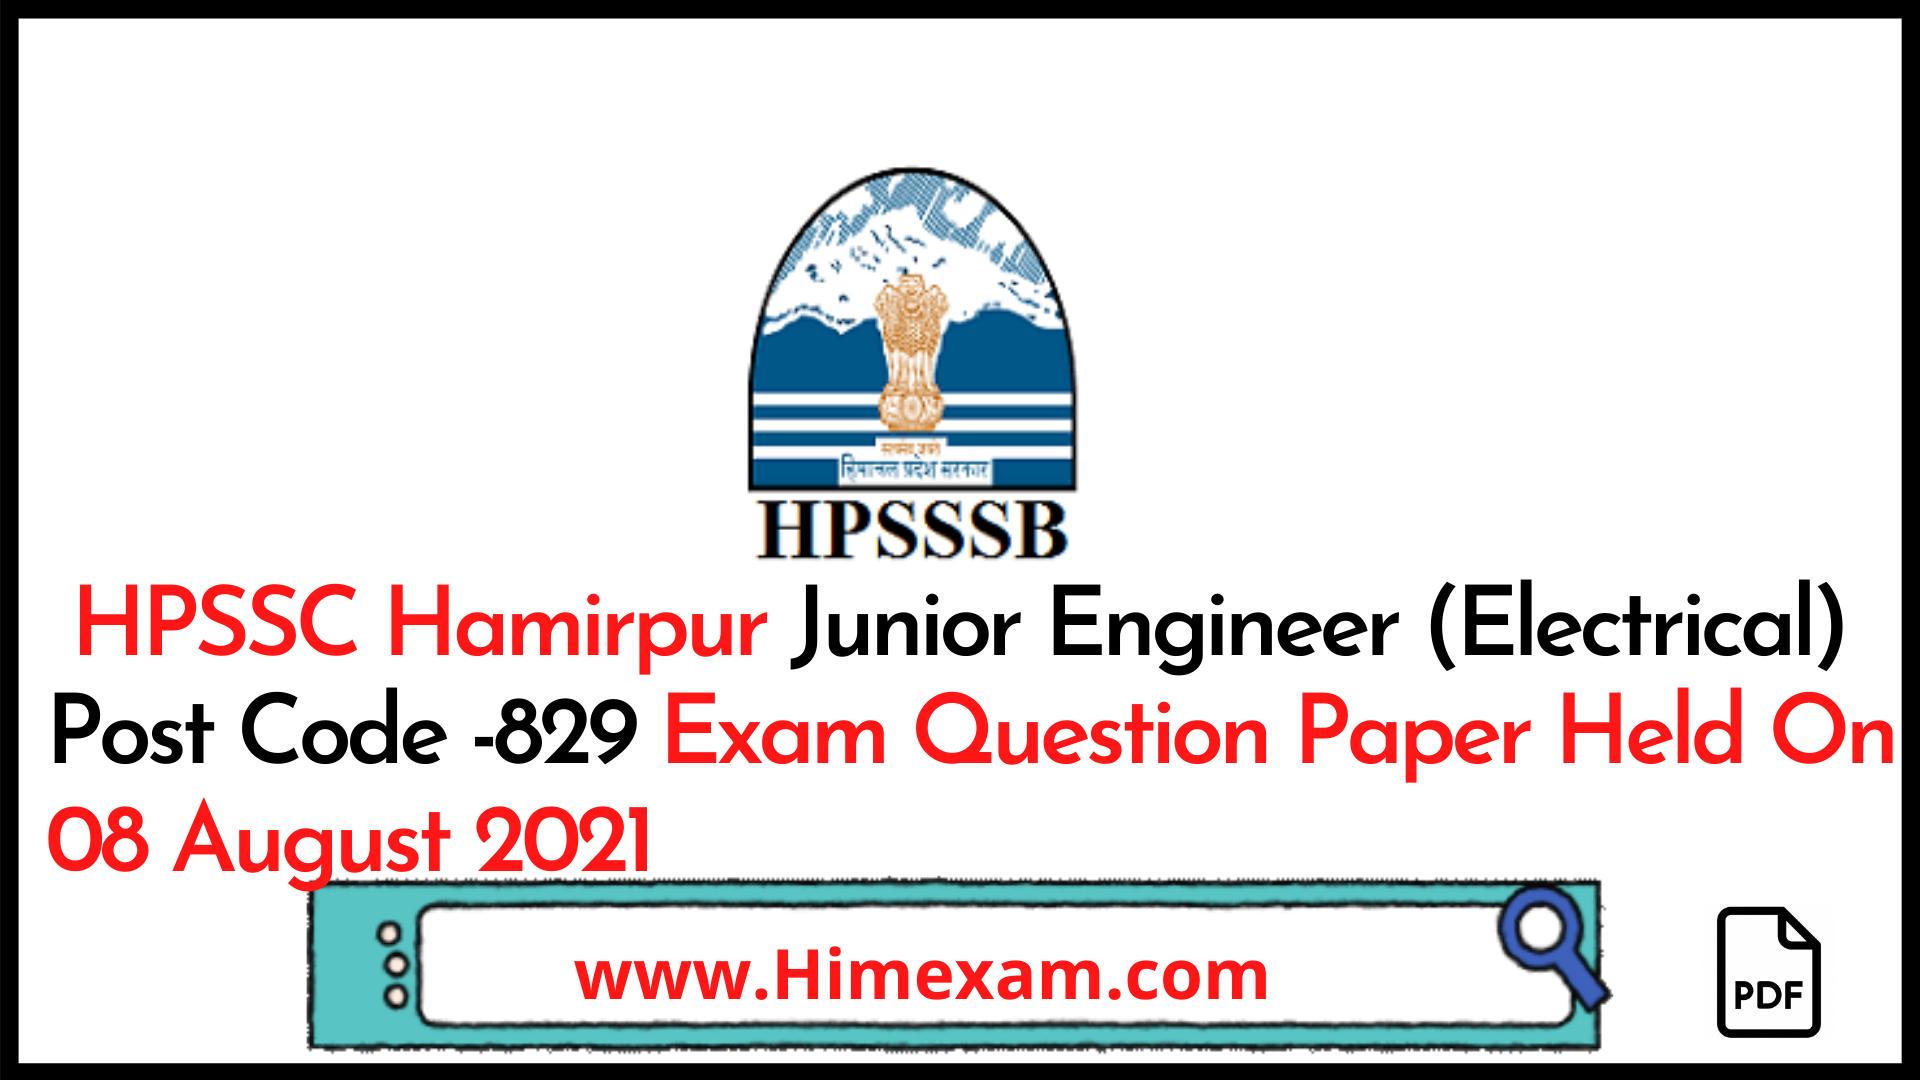 HPSSC Hamirpur Junior Engineer (Electrical) Post Code -829 Exam Question Paper Held On 08 August 2021